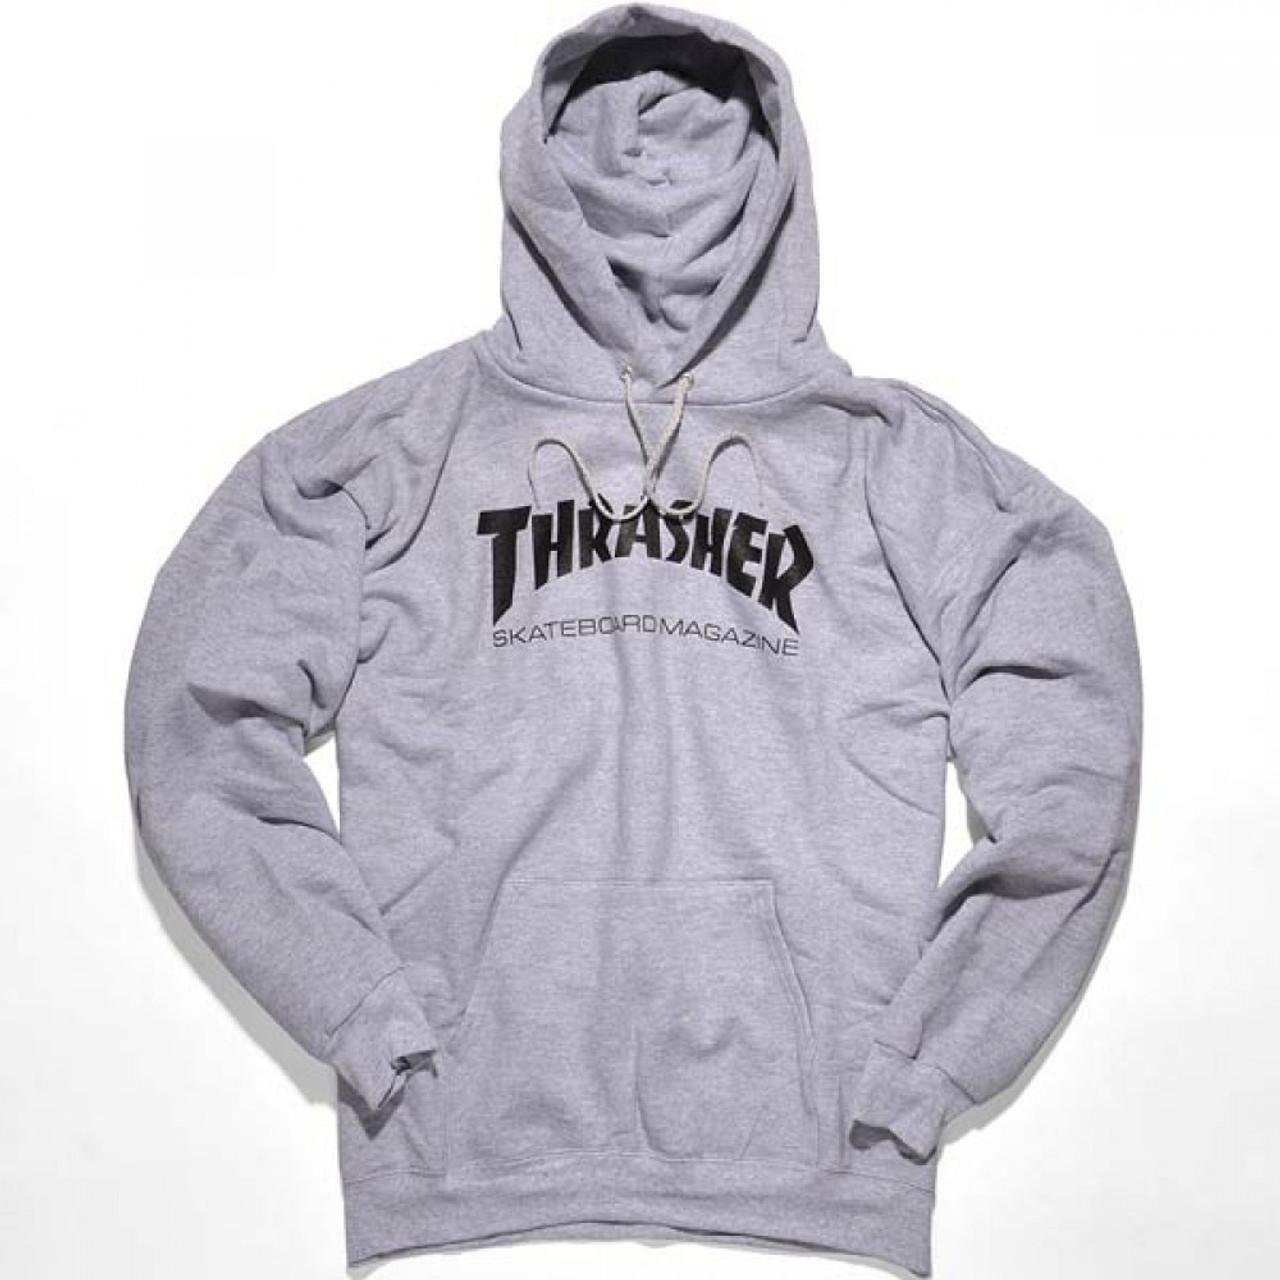 31f1adc55321 Thrasher Skate Mag Hoodie Grey Black Xl